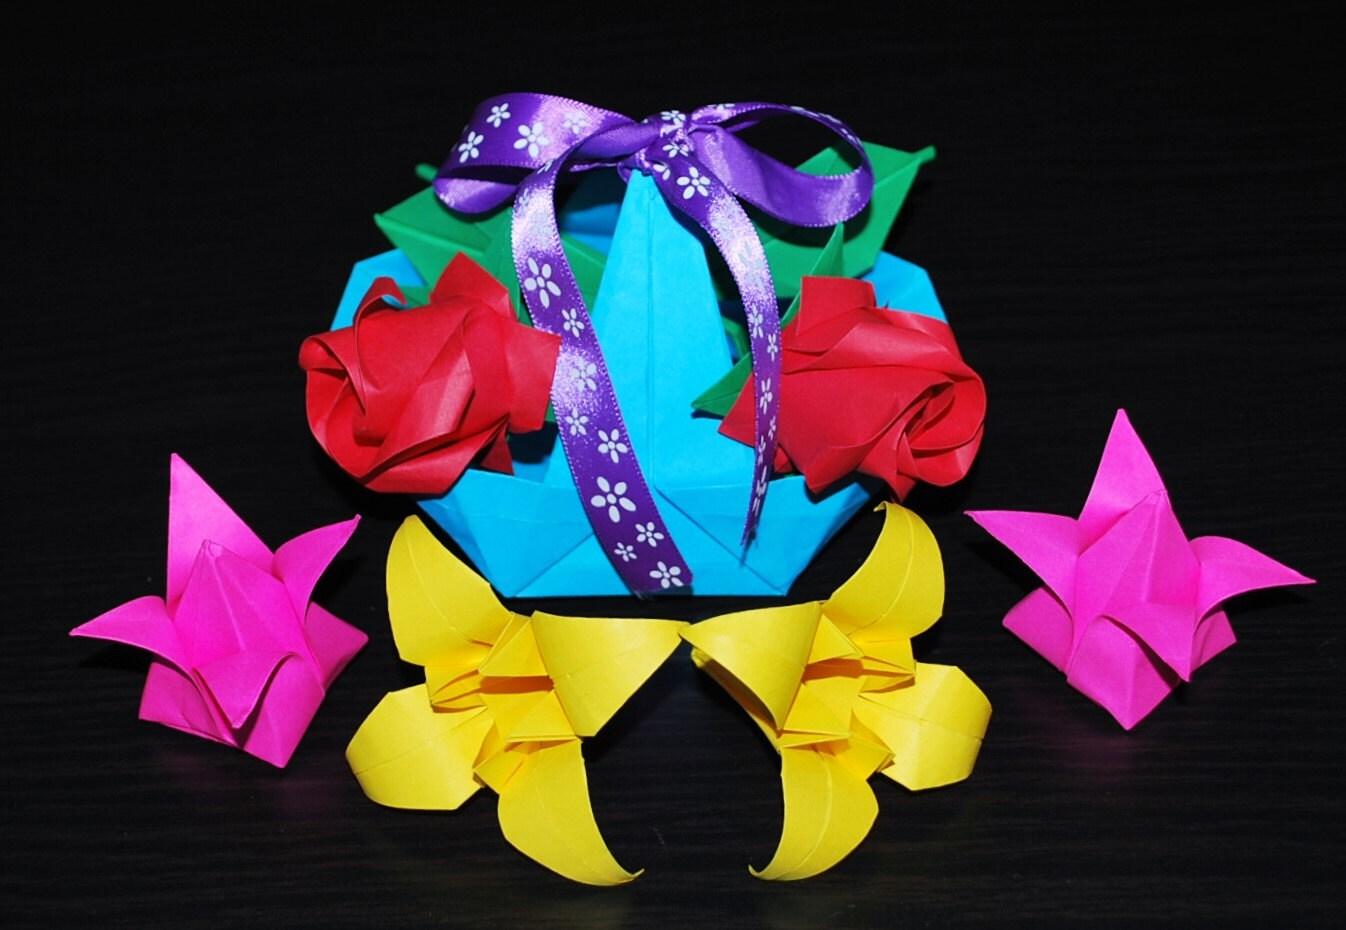 Origami Flowers Flower Basket Origami Roses Lilies